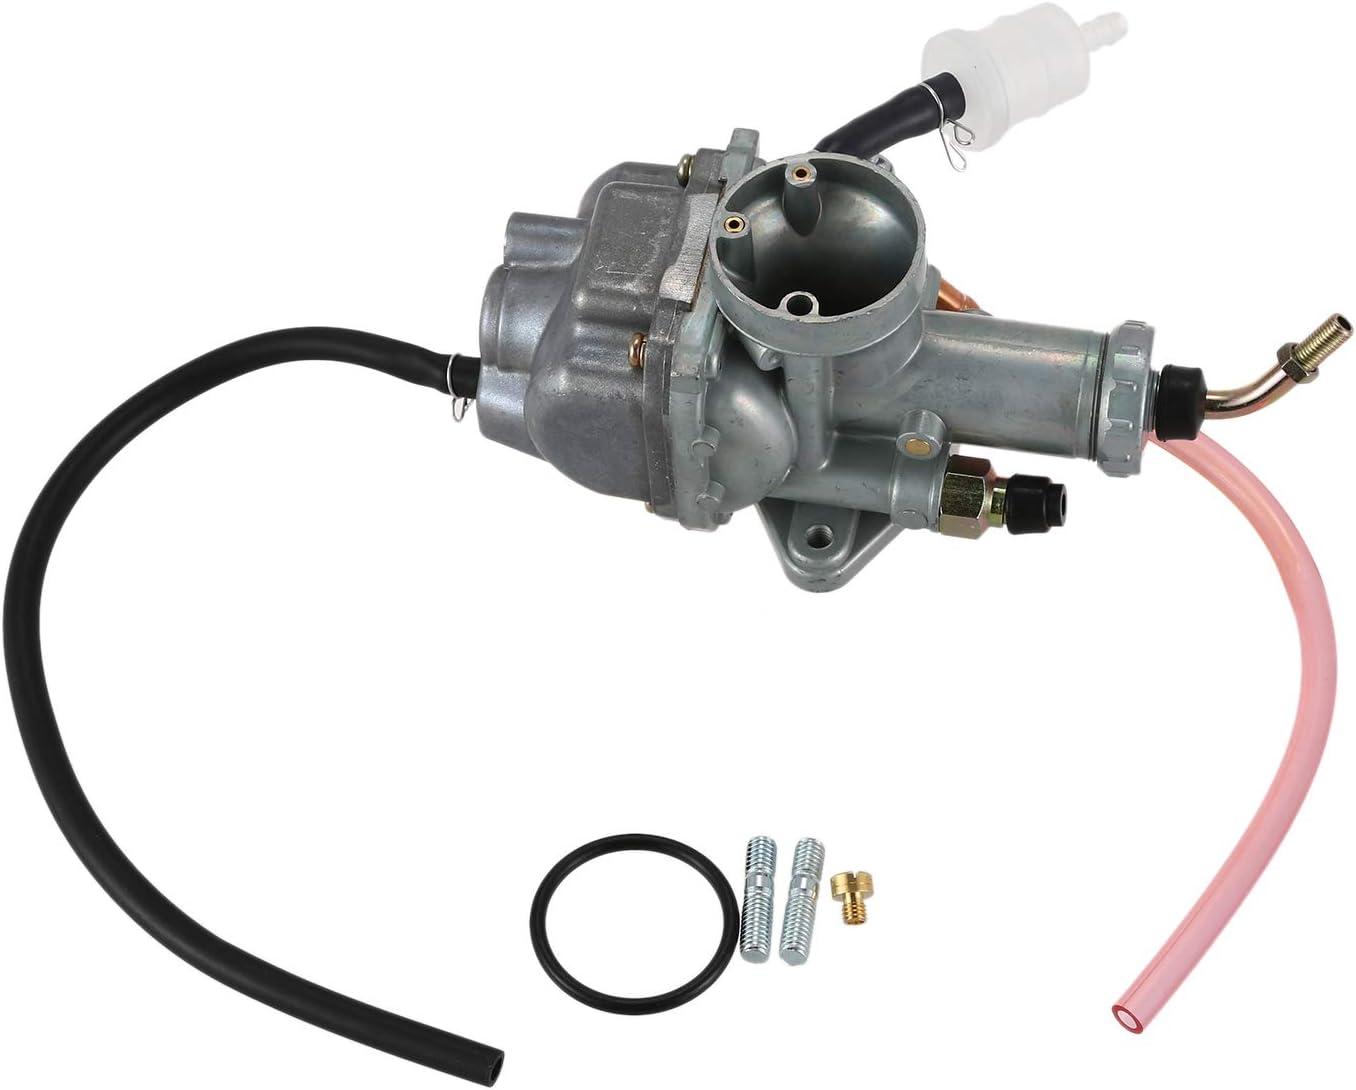 WOVELOT Carburateur pour Breeze 125 YFA1 Moto 4 YFM225 Timberwolf 250 YFB250